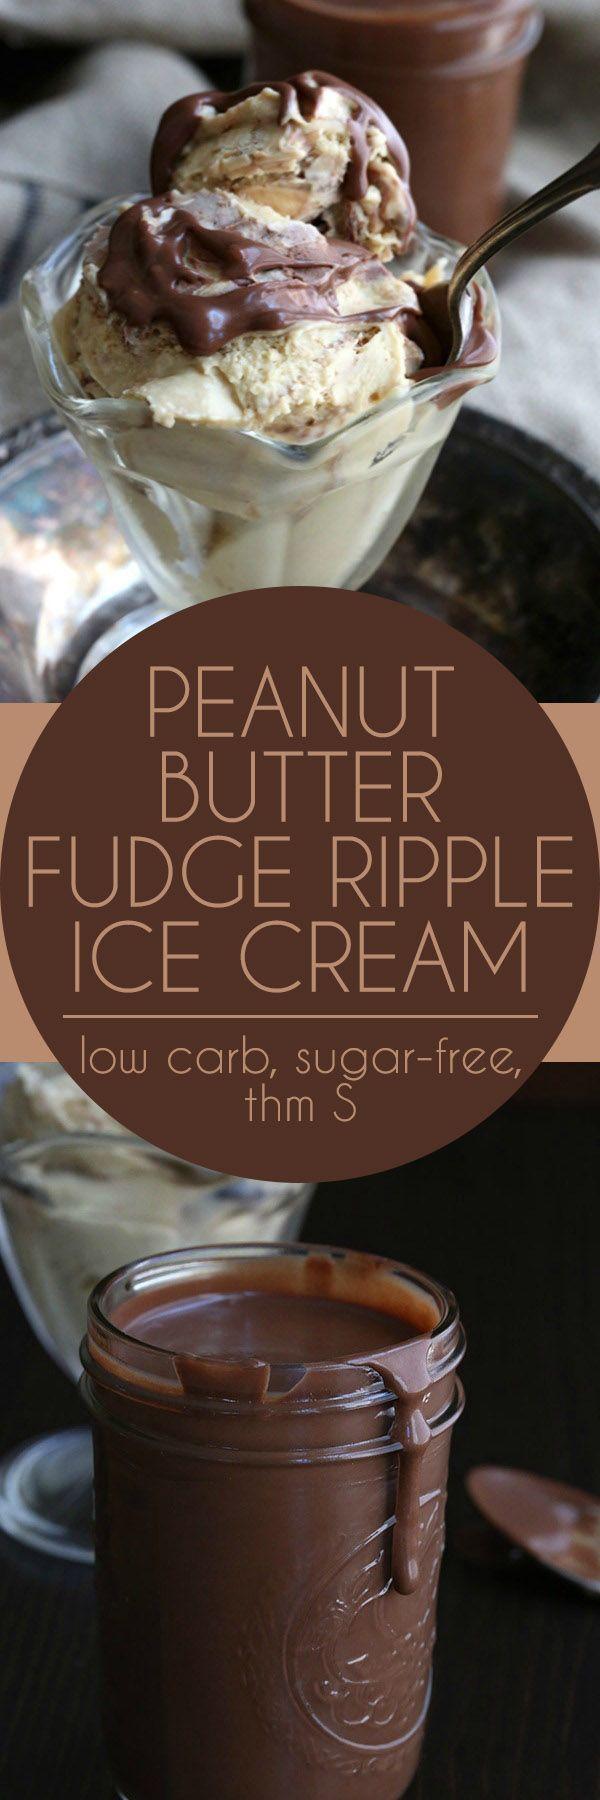 330 best 21 Day Sugar Detox images on Pinterest | 21 day sugar detox, Sugar detox diet and 21 ...